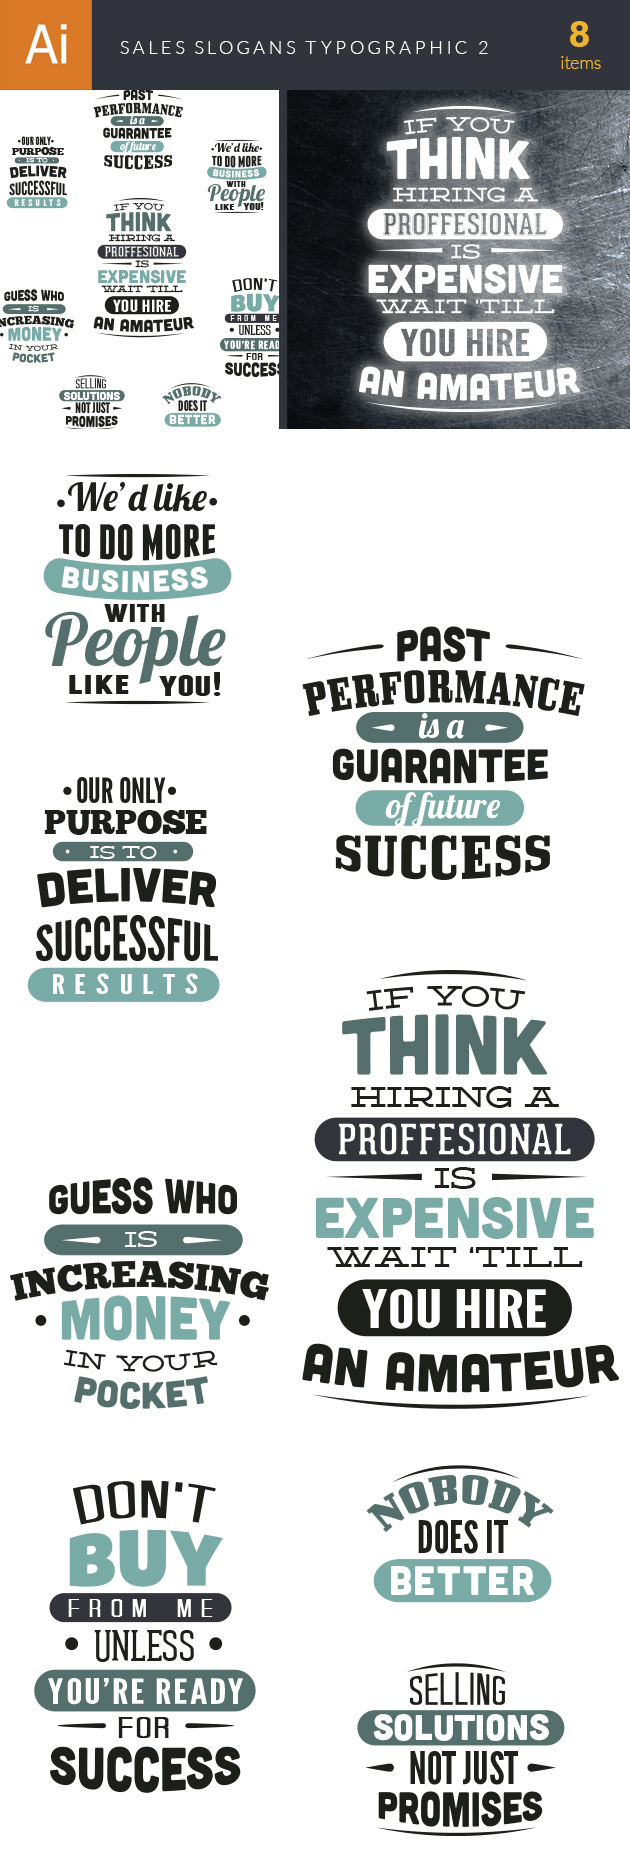 Sales Slogans Typographic Elements 2 6